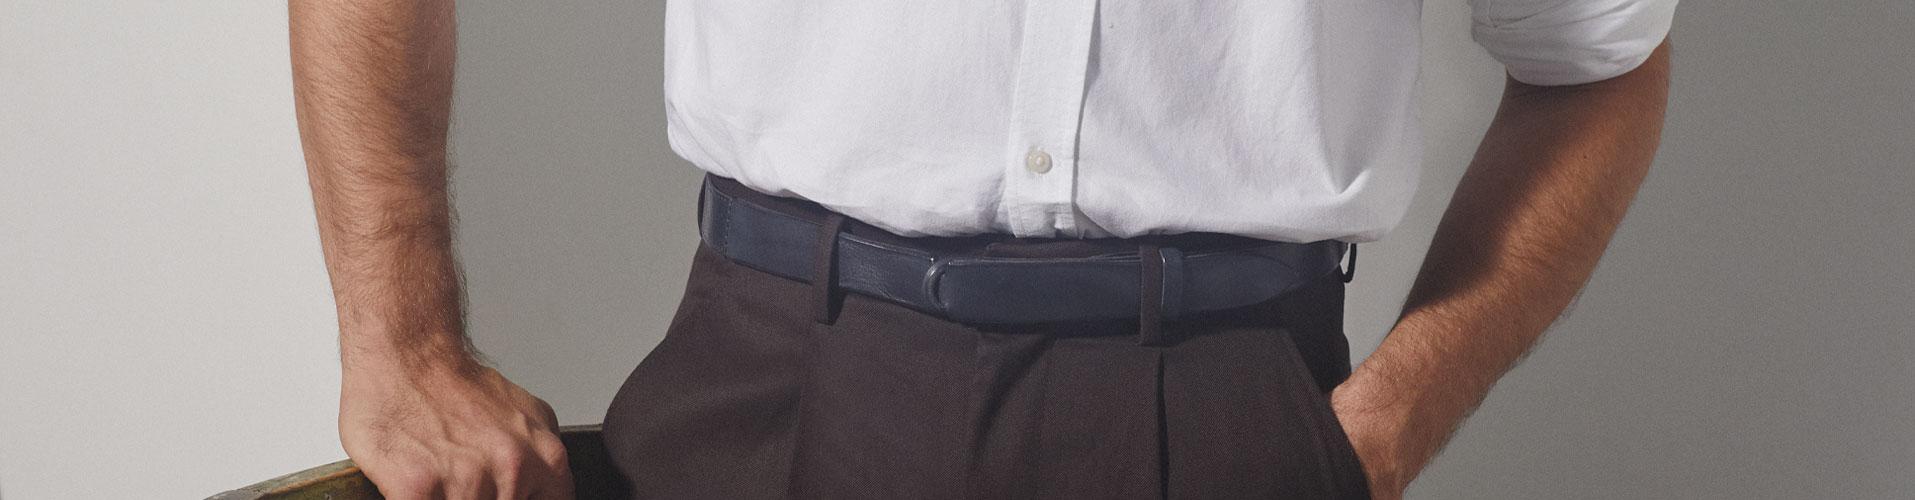 ORCIANI | Cinture Nobuckle in pelle senza fibbia | Shop online